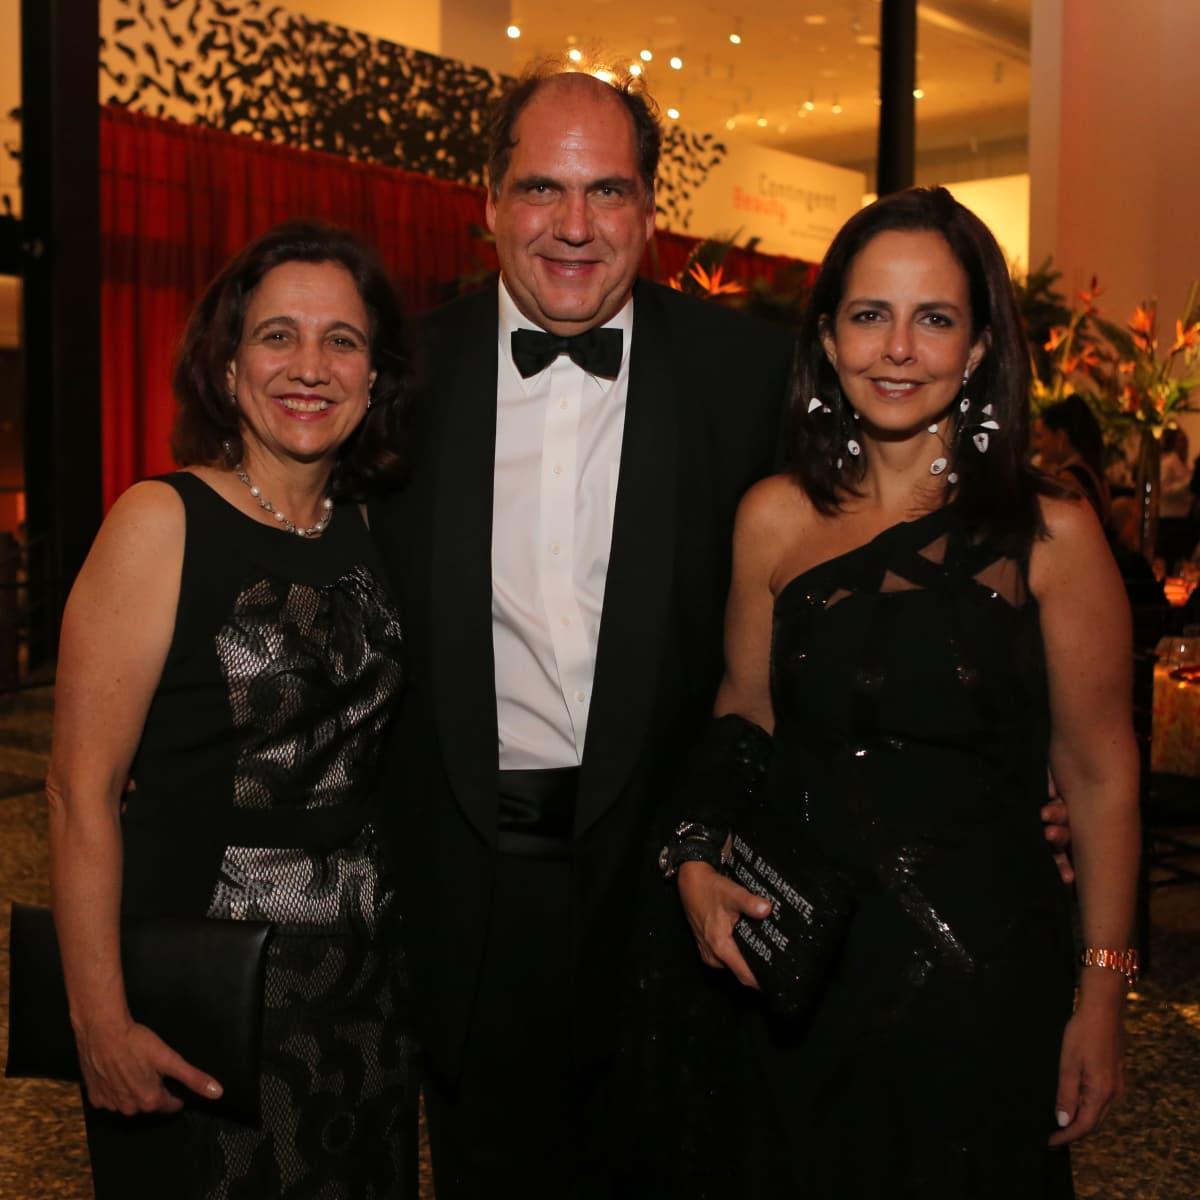 News, MFAH Latin Experience, Nov. 2015 Ana Milena Munoz; Steven and Solita Mishaan